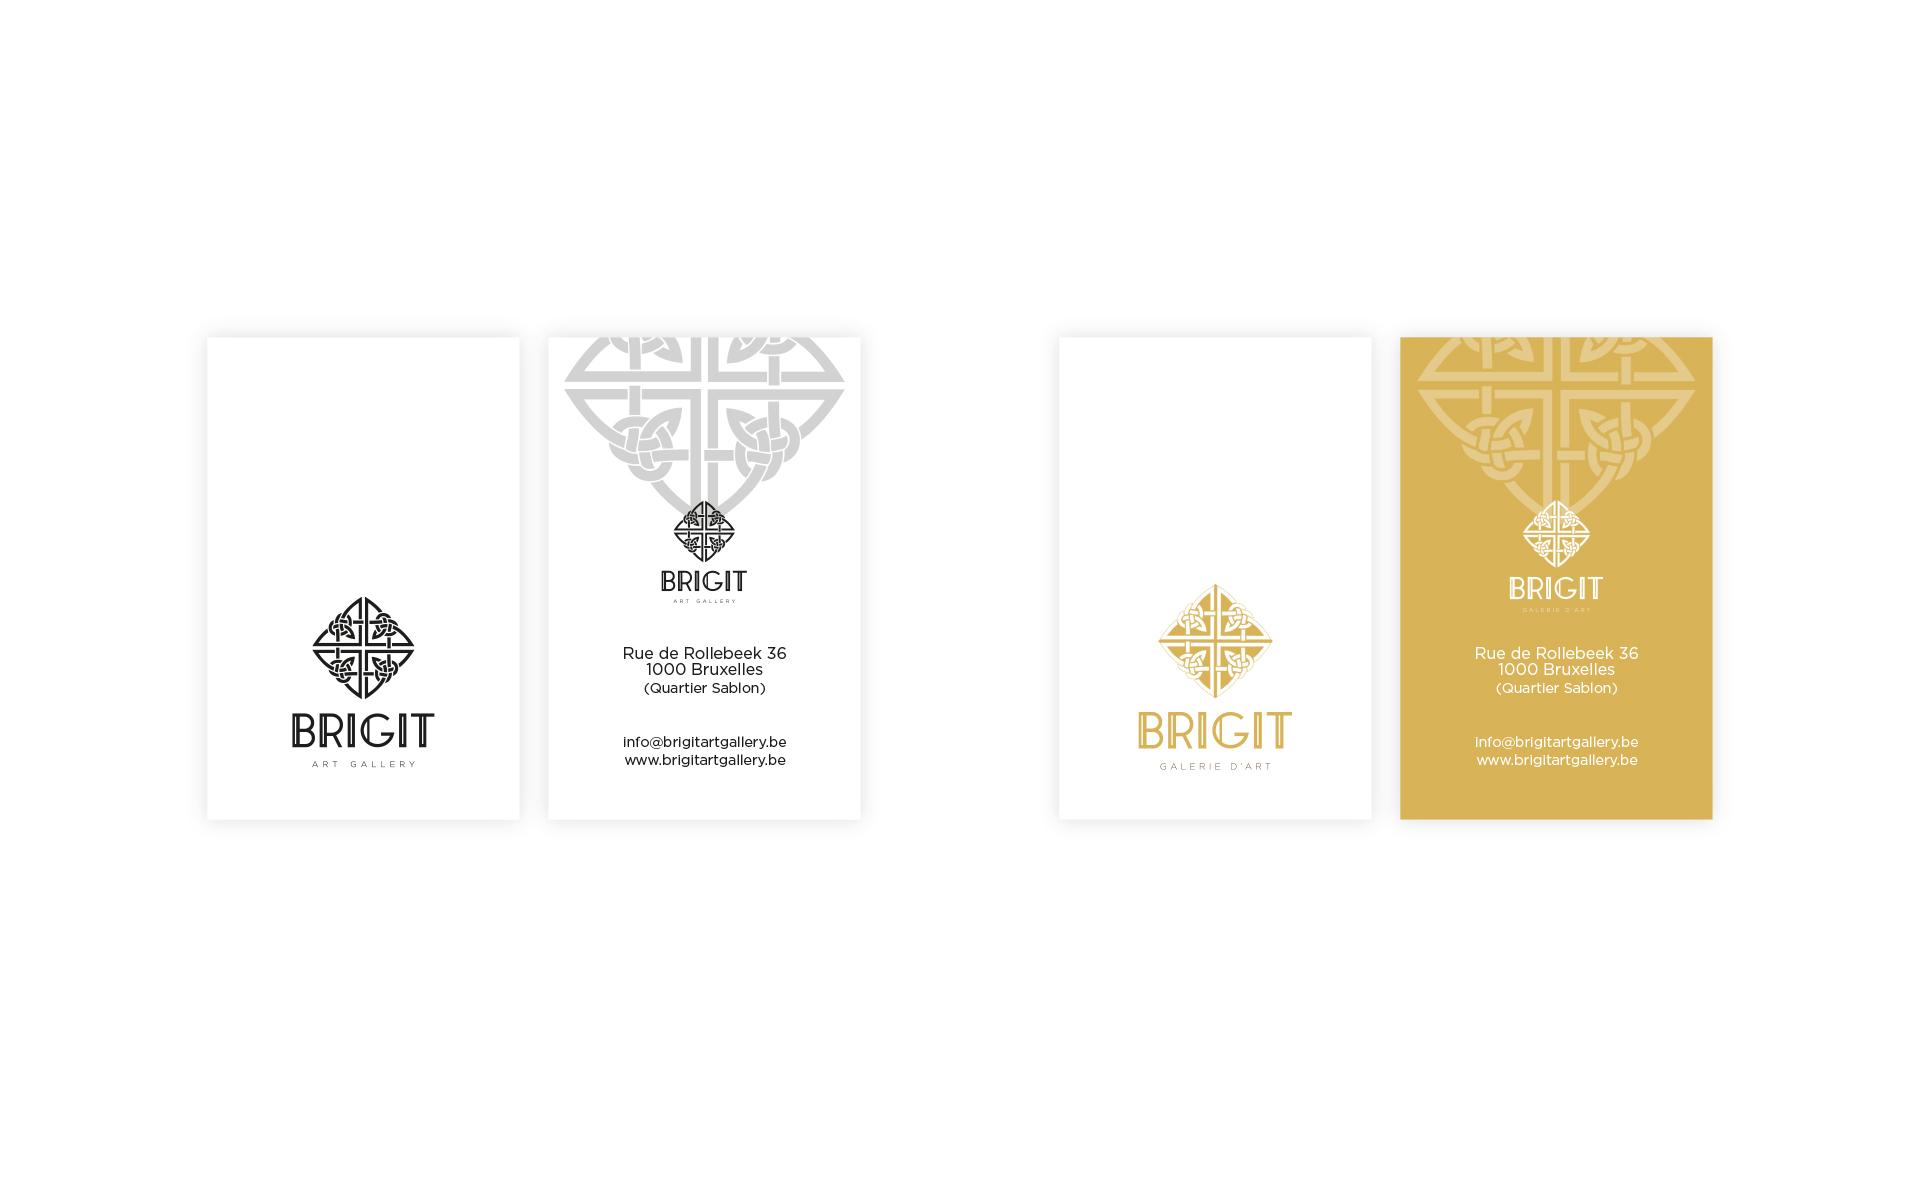 brigit business card design.jpg